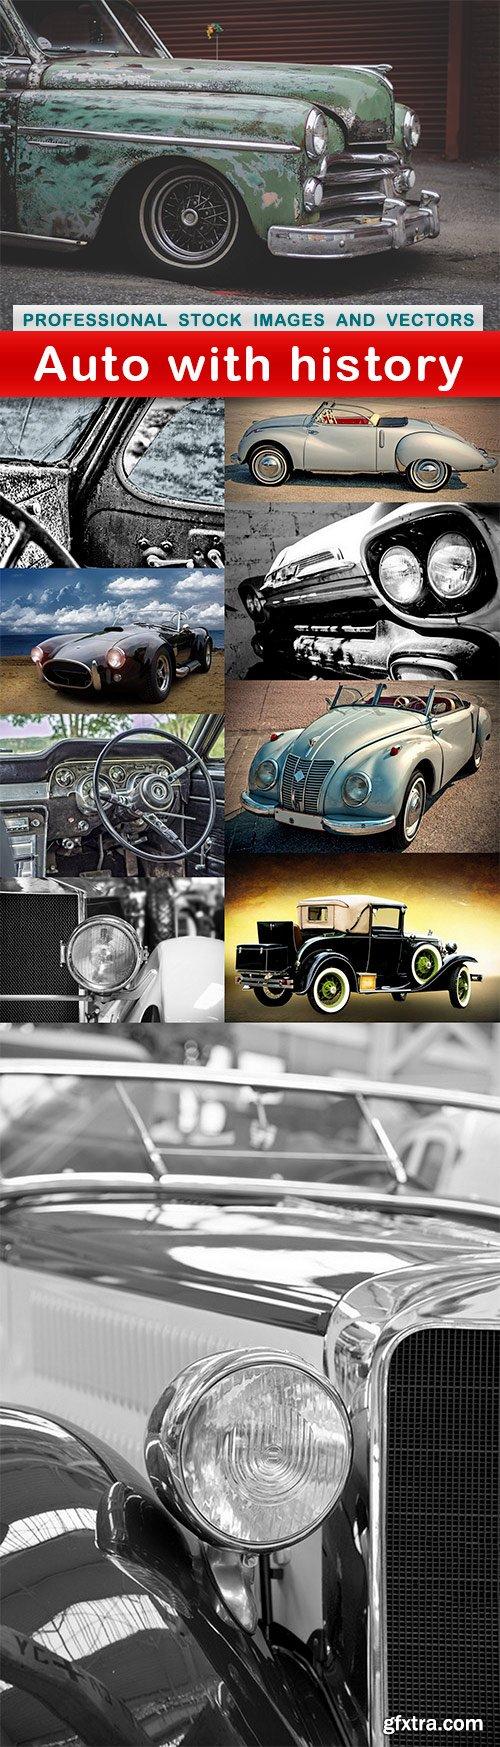 Auto with history - 10 UHQ JPEG